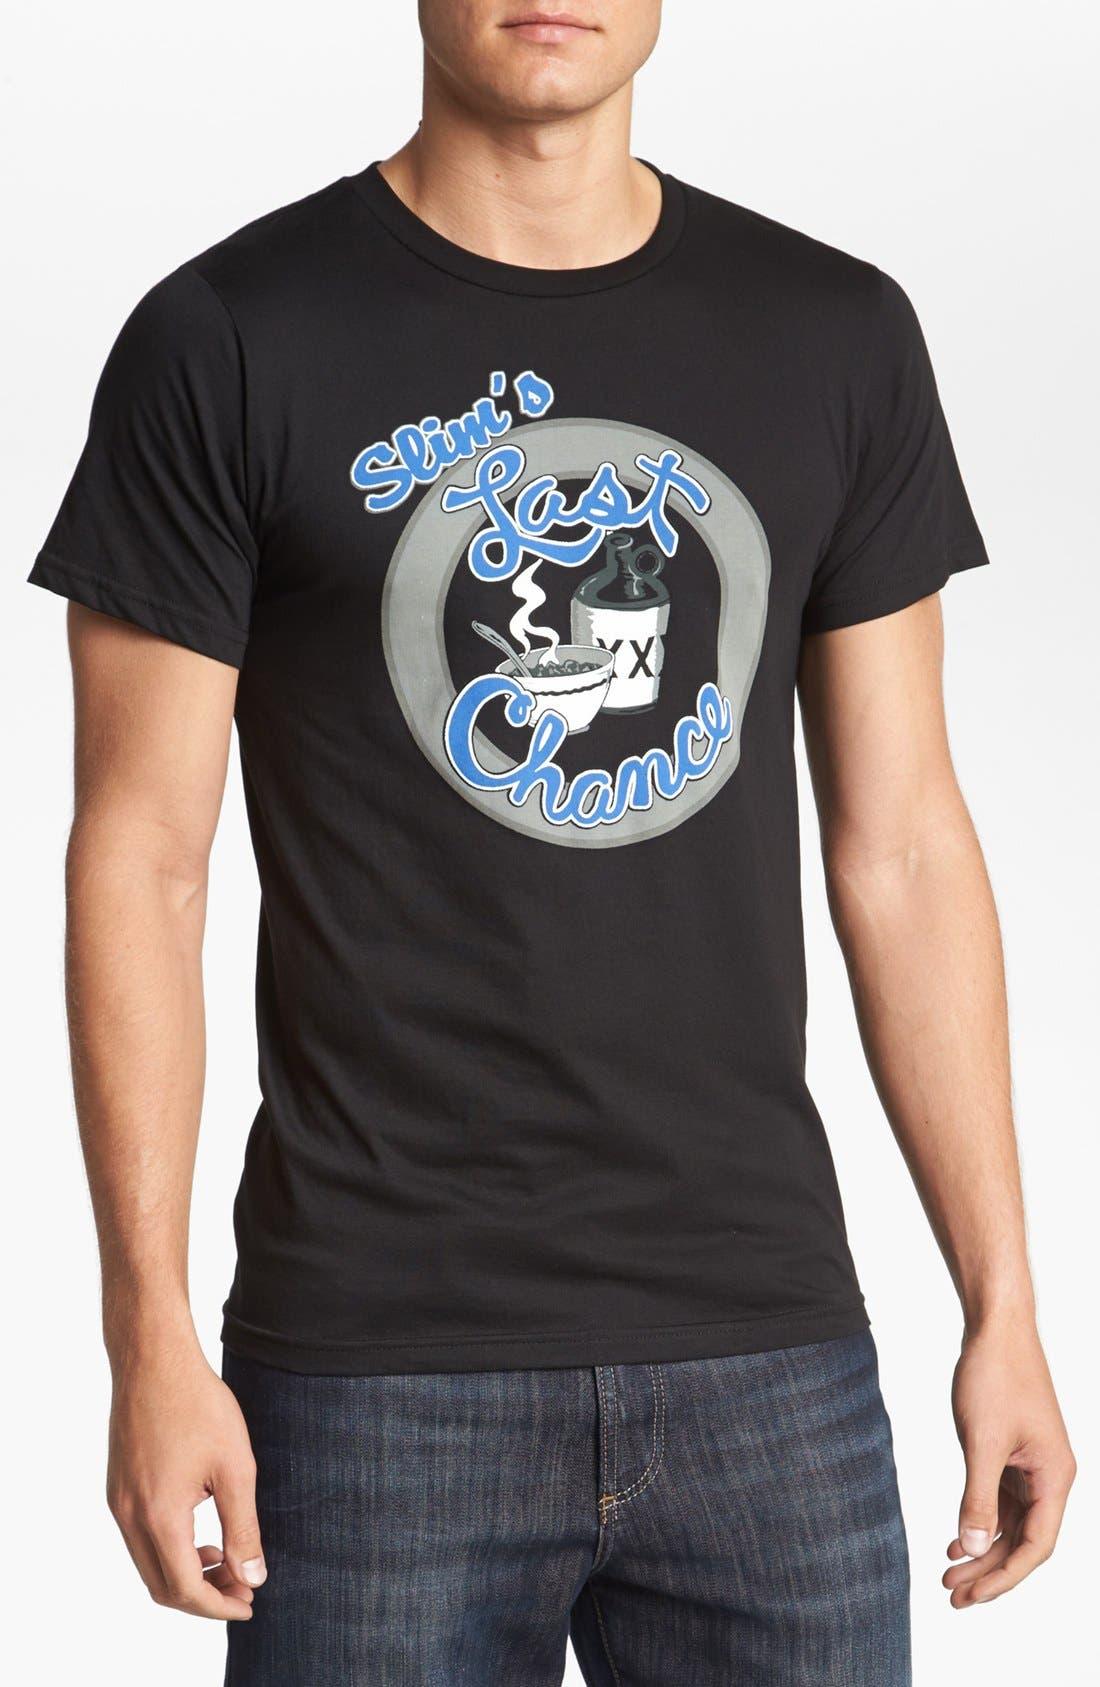 Alternate Image 1 Selected - Horses Cut Shop 'Slim's Last Chance' T-Shirt